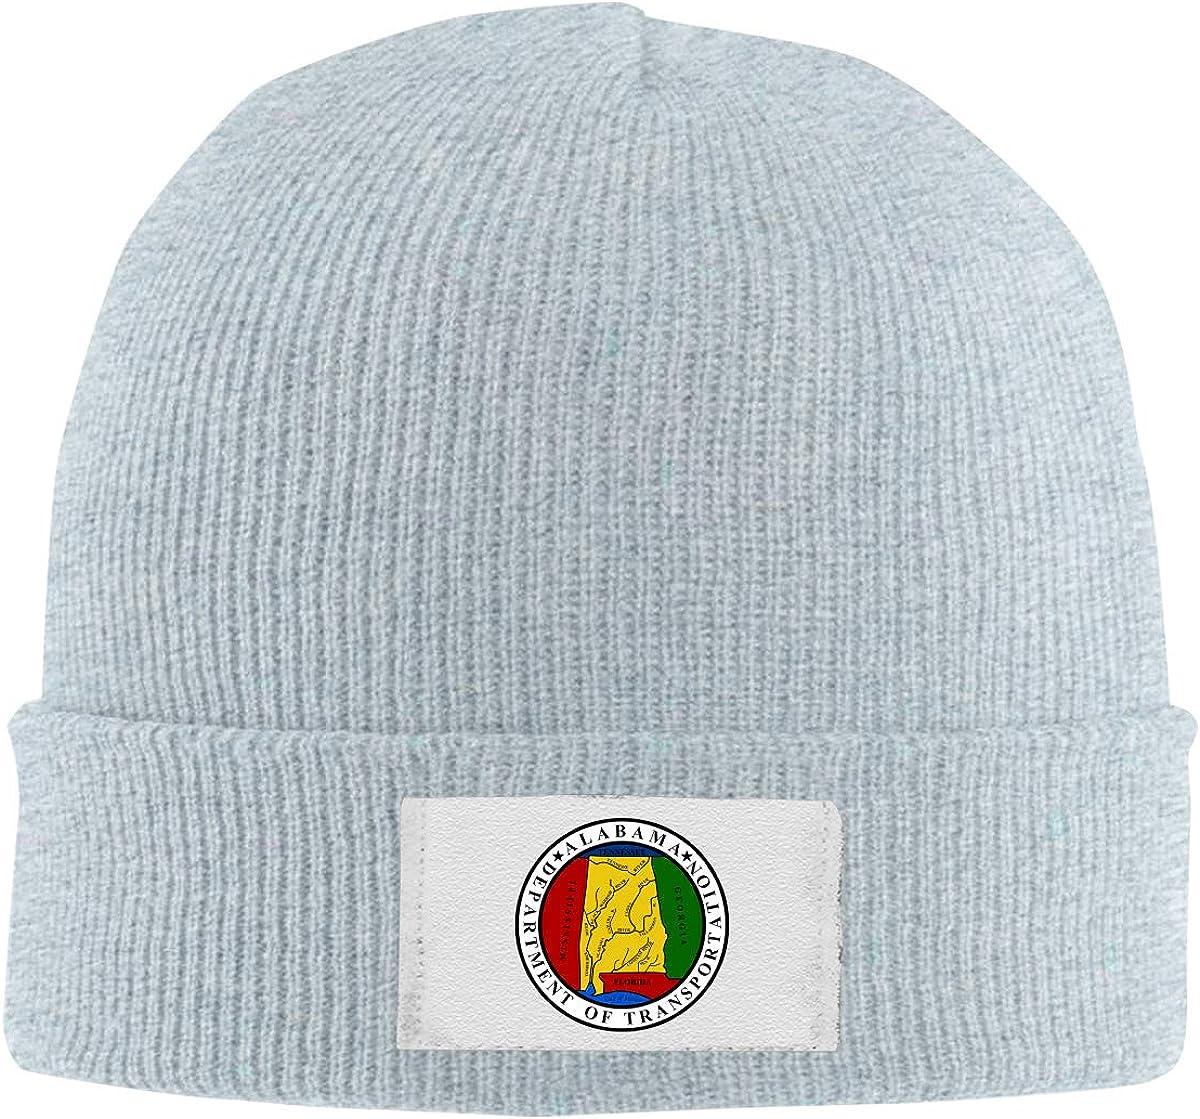 RZMdSG Seal of The Alabama Department of Transportation Unisex Winter Printed Warm Knitting Hats Skull Cap